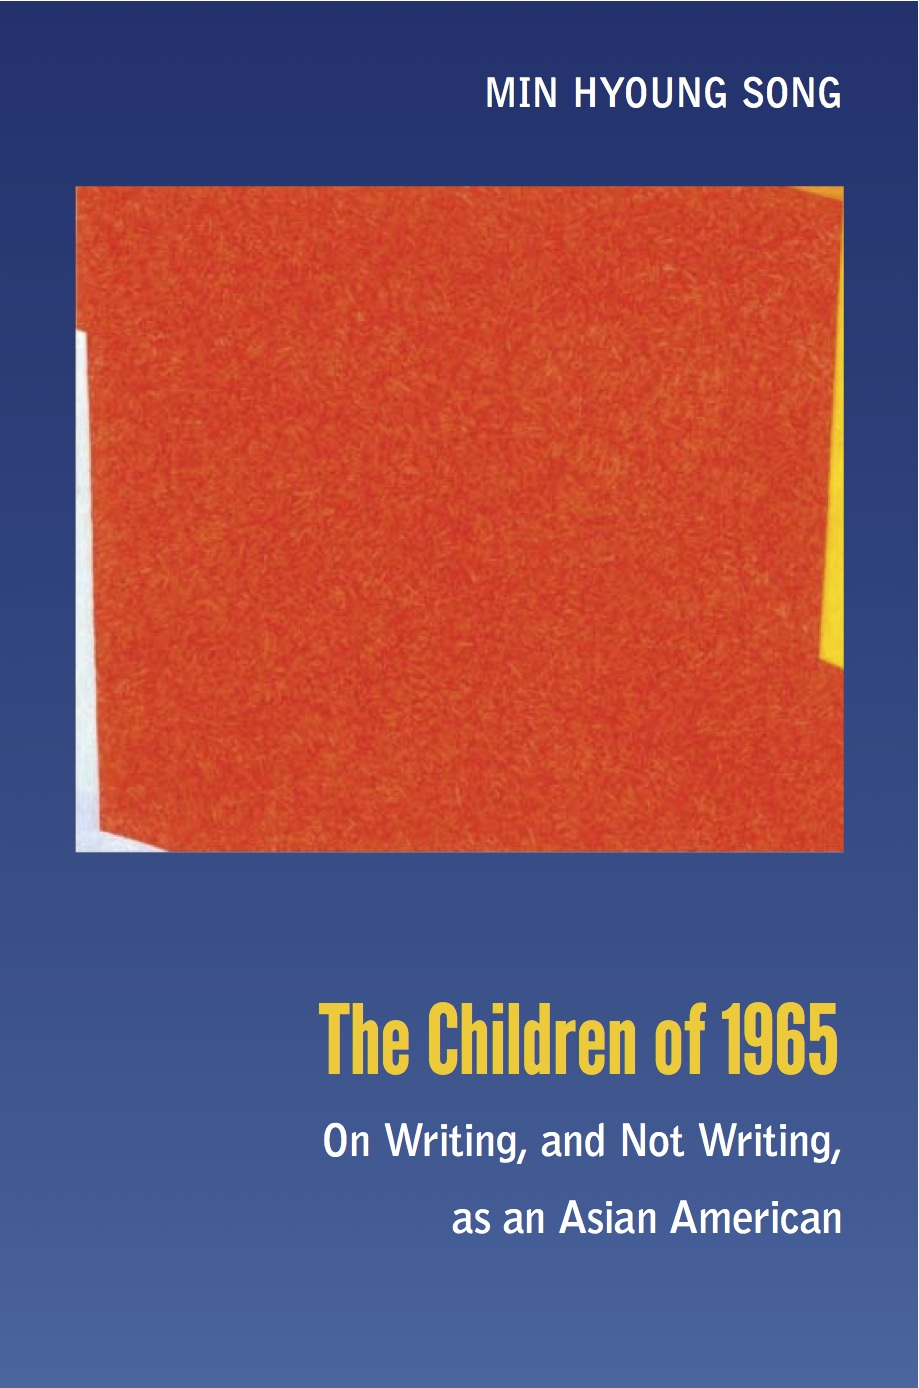 Association for asian studies book prizes children